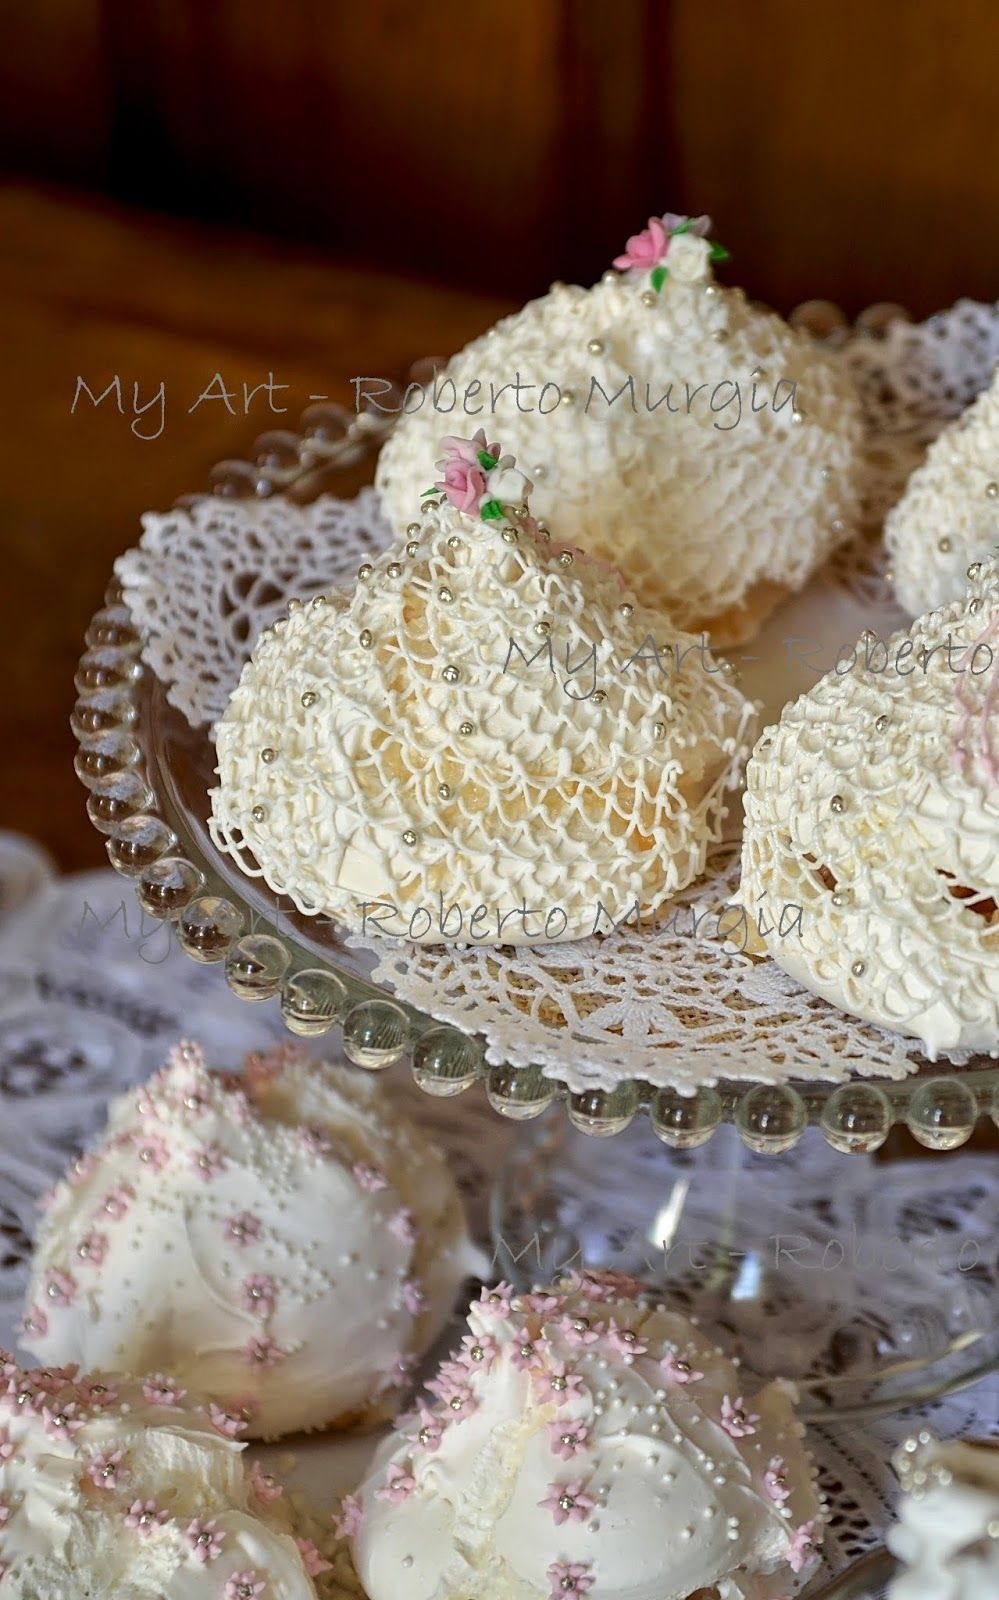 Ricetta dei pastissus dolci sardi dolci tipici desserts t for Ricette dolci sardi